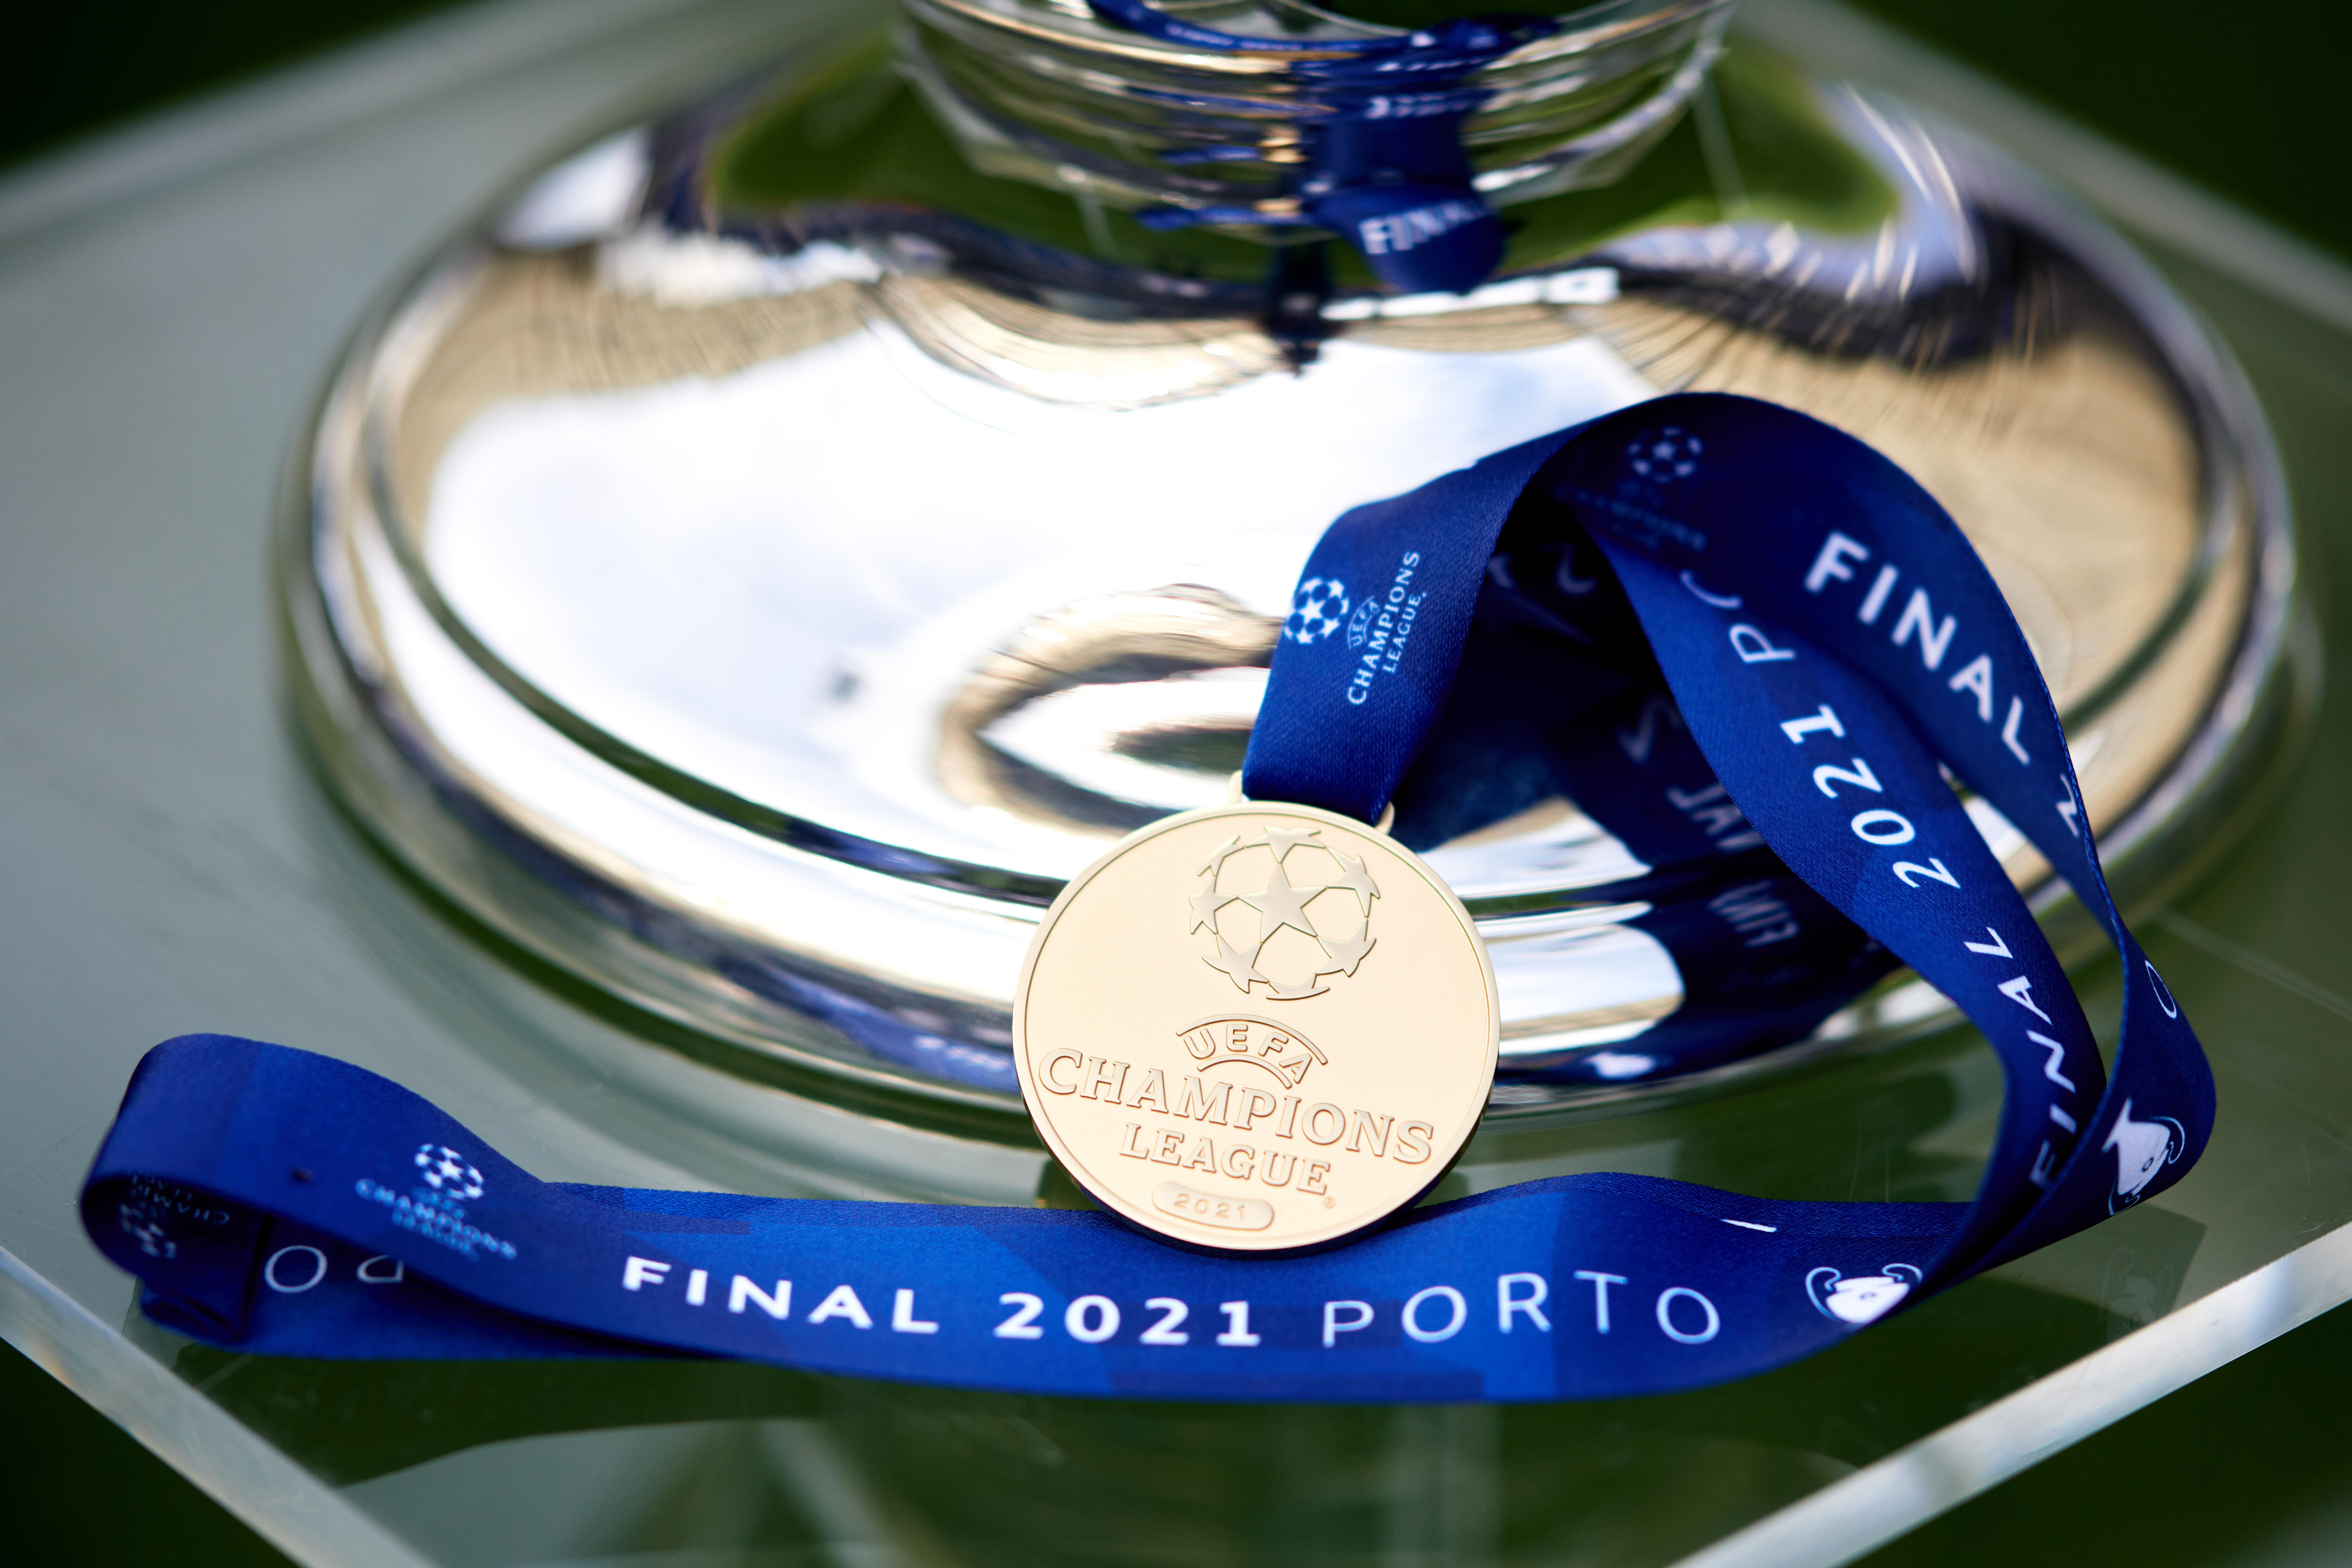 Manchester City v Chelsea - UEFA Champions League Final Previews